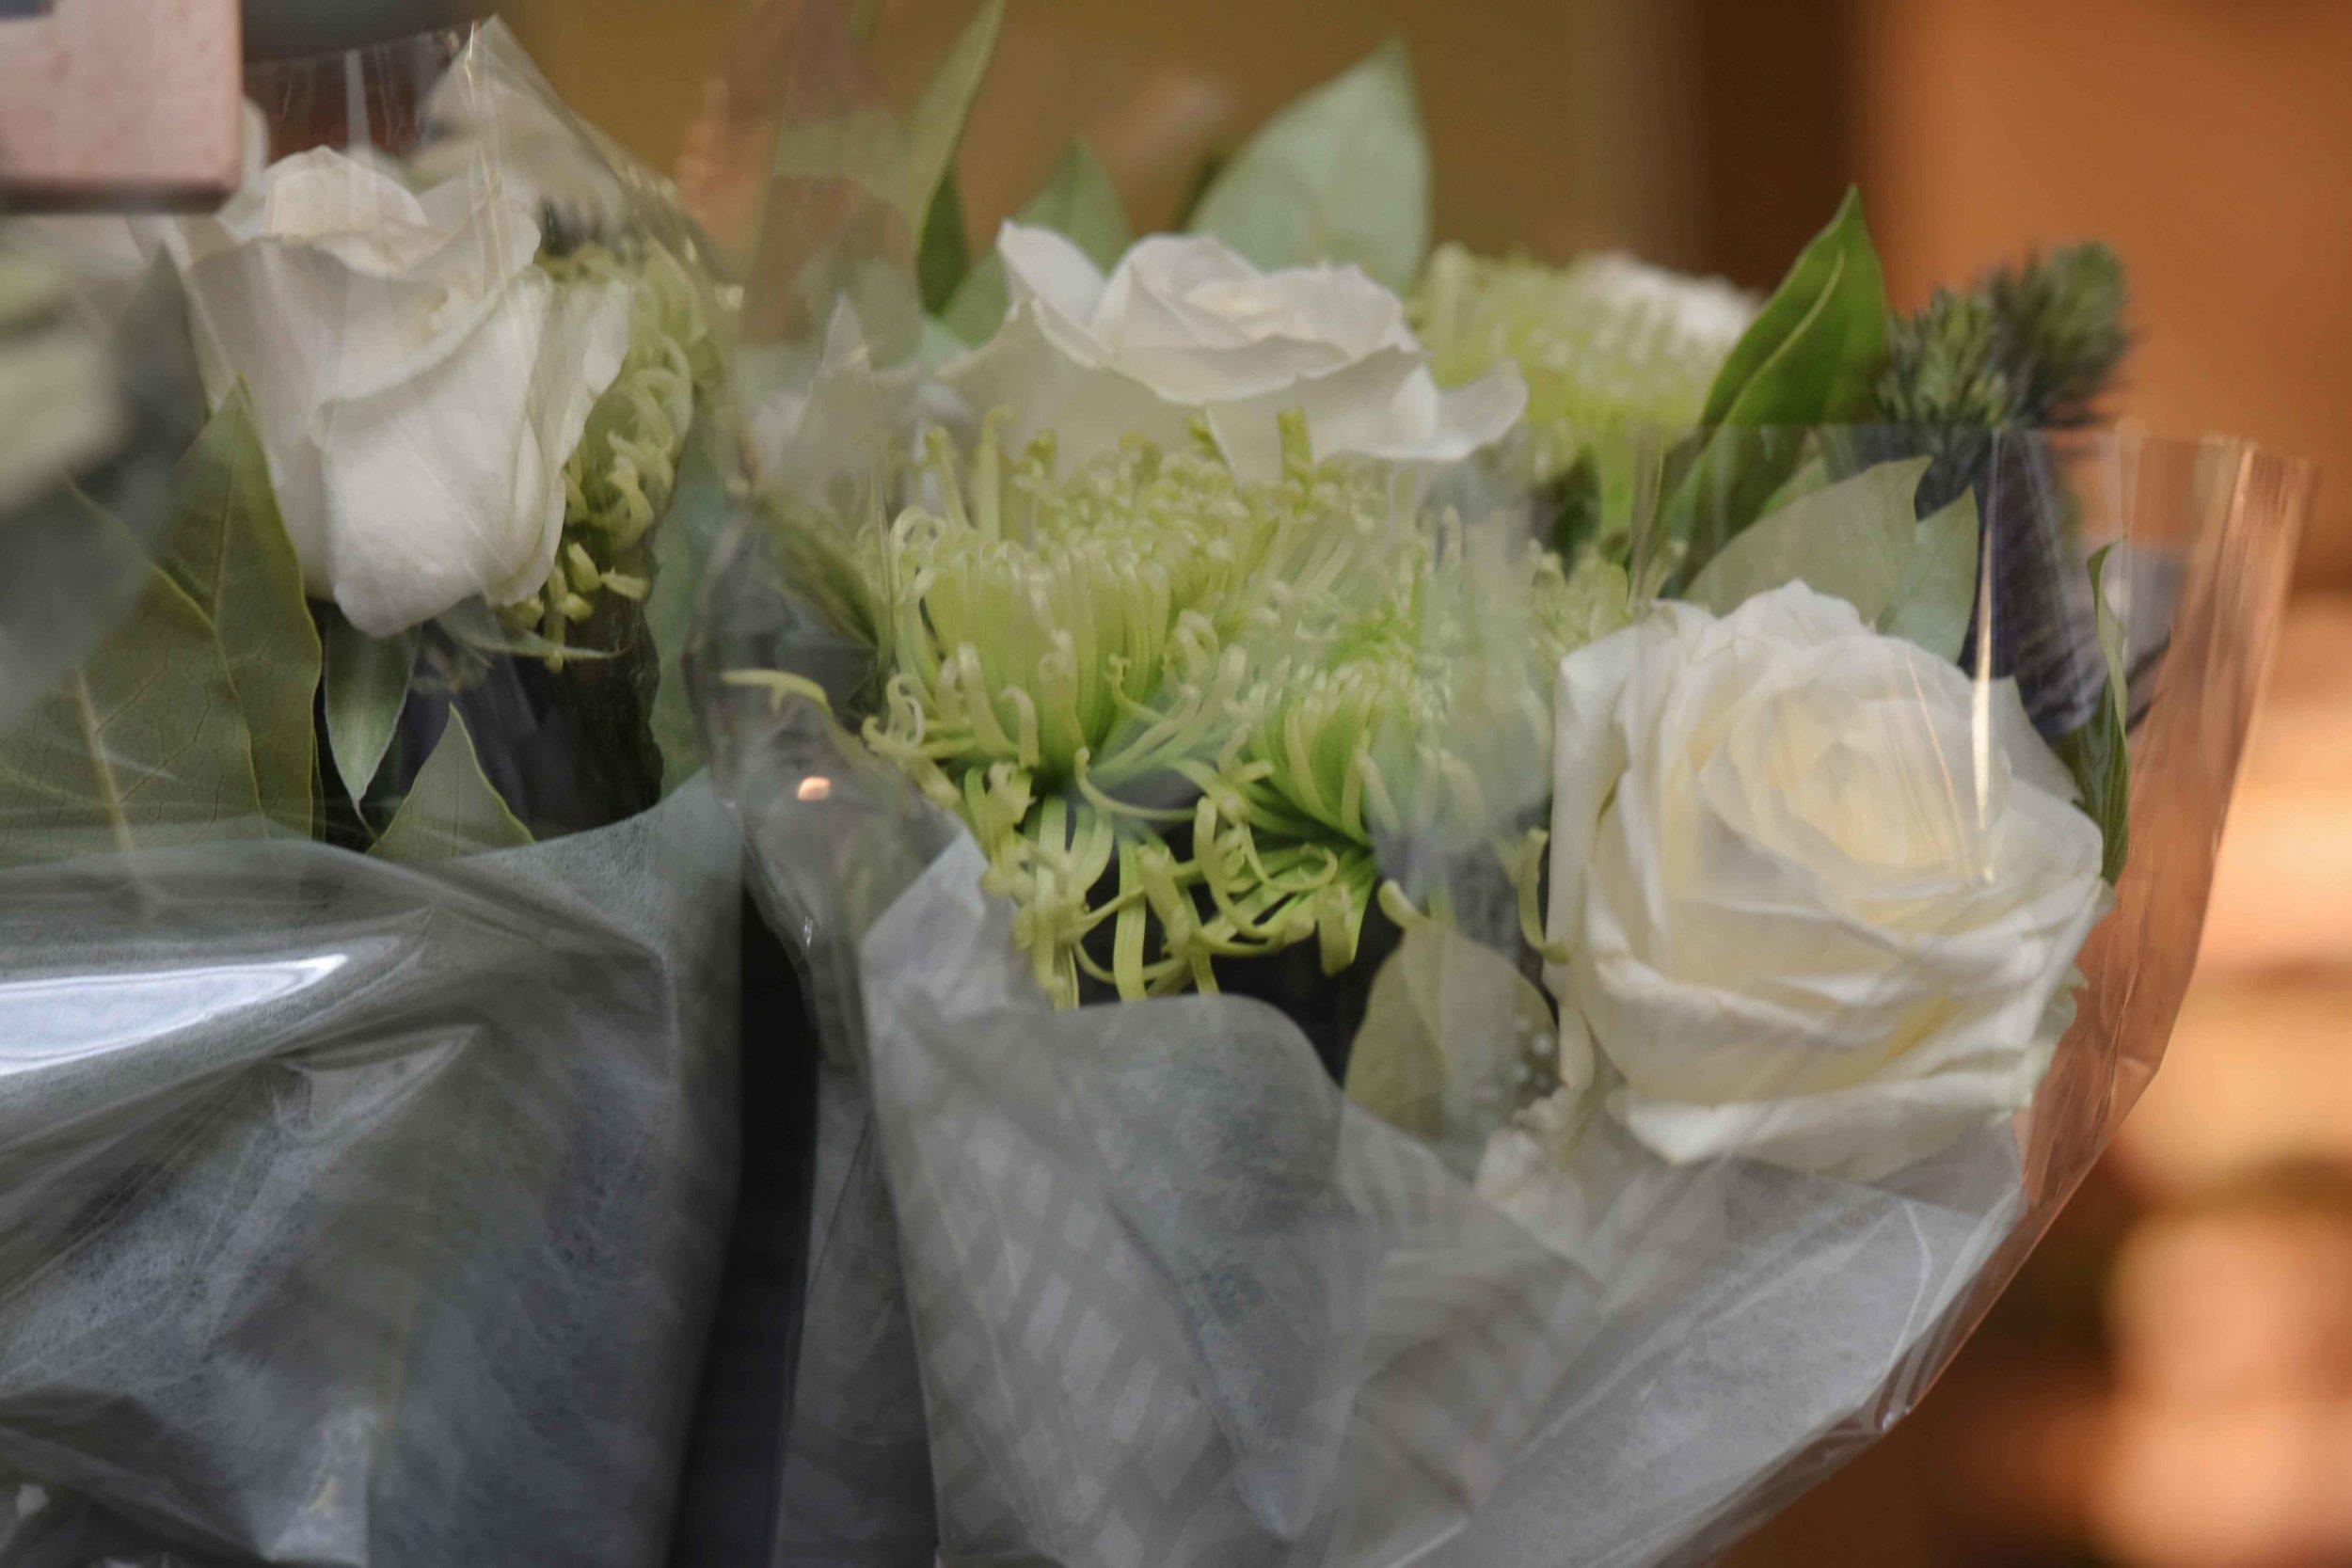 White roses, High Street Kensington, London. Image©sourcingstyle.com